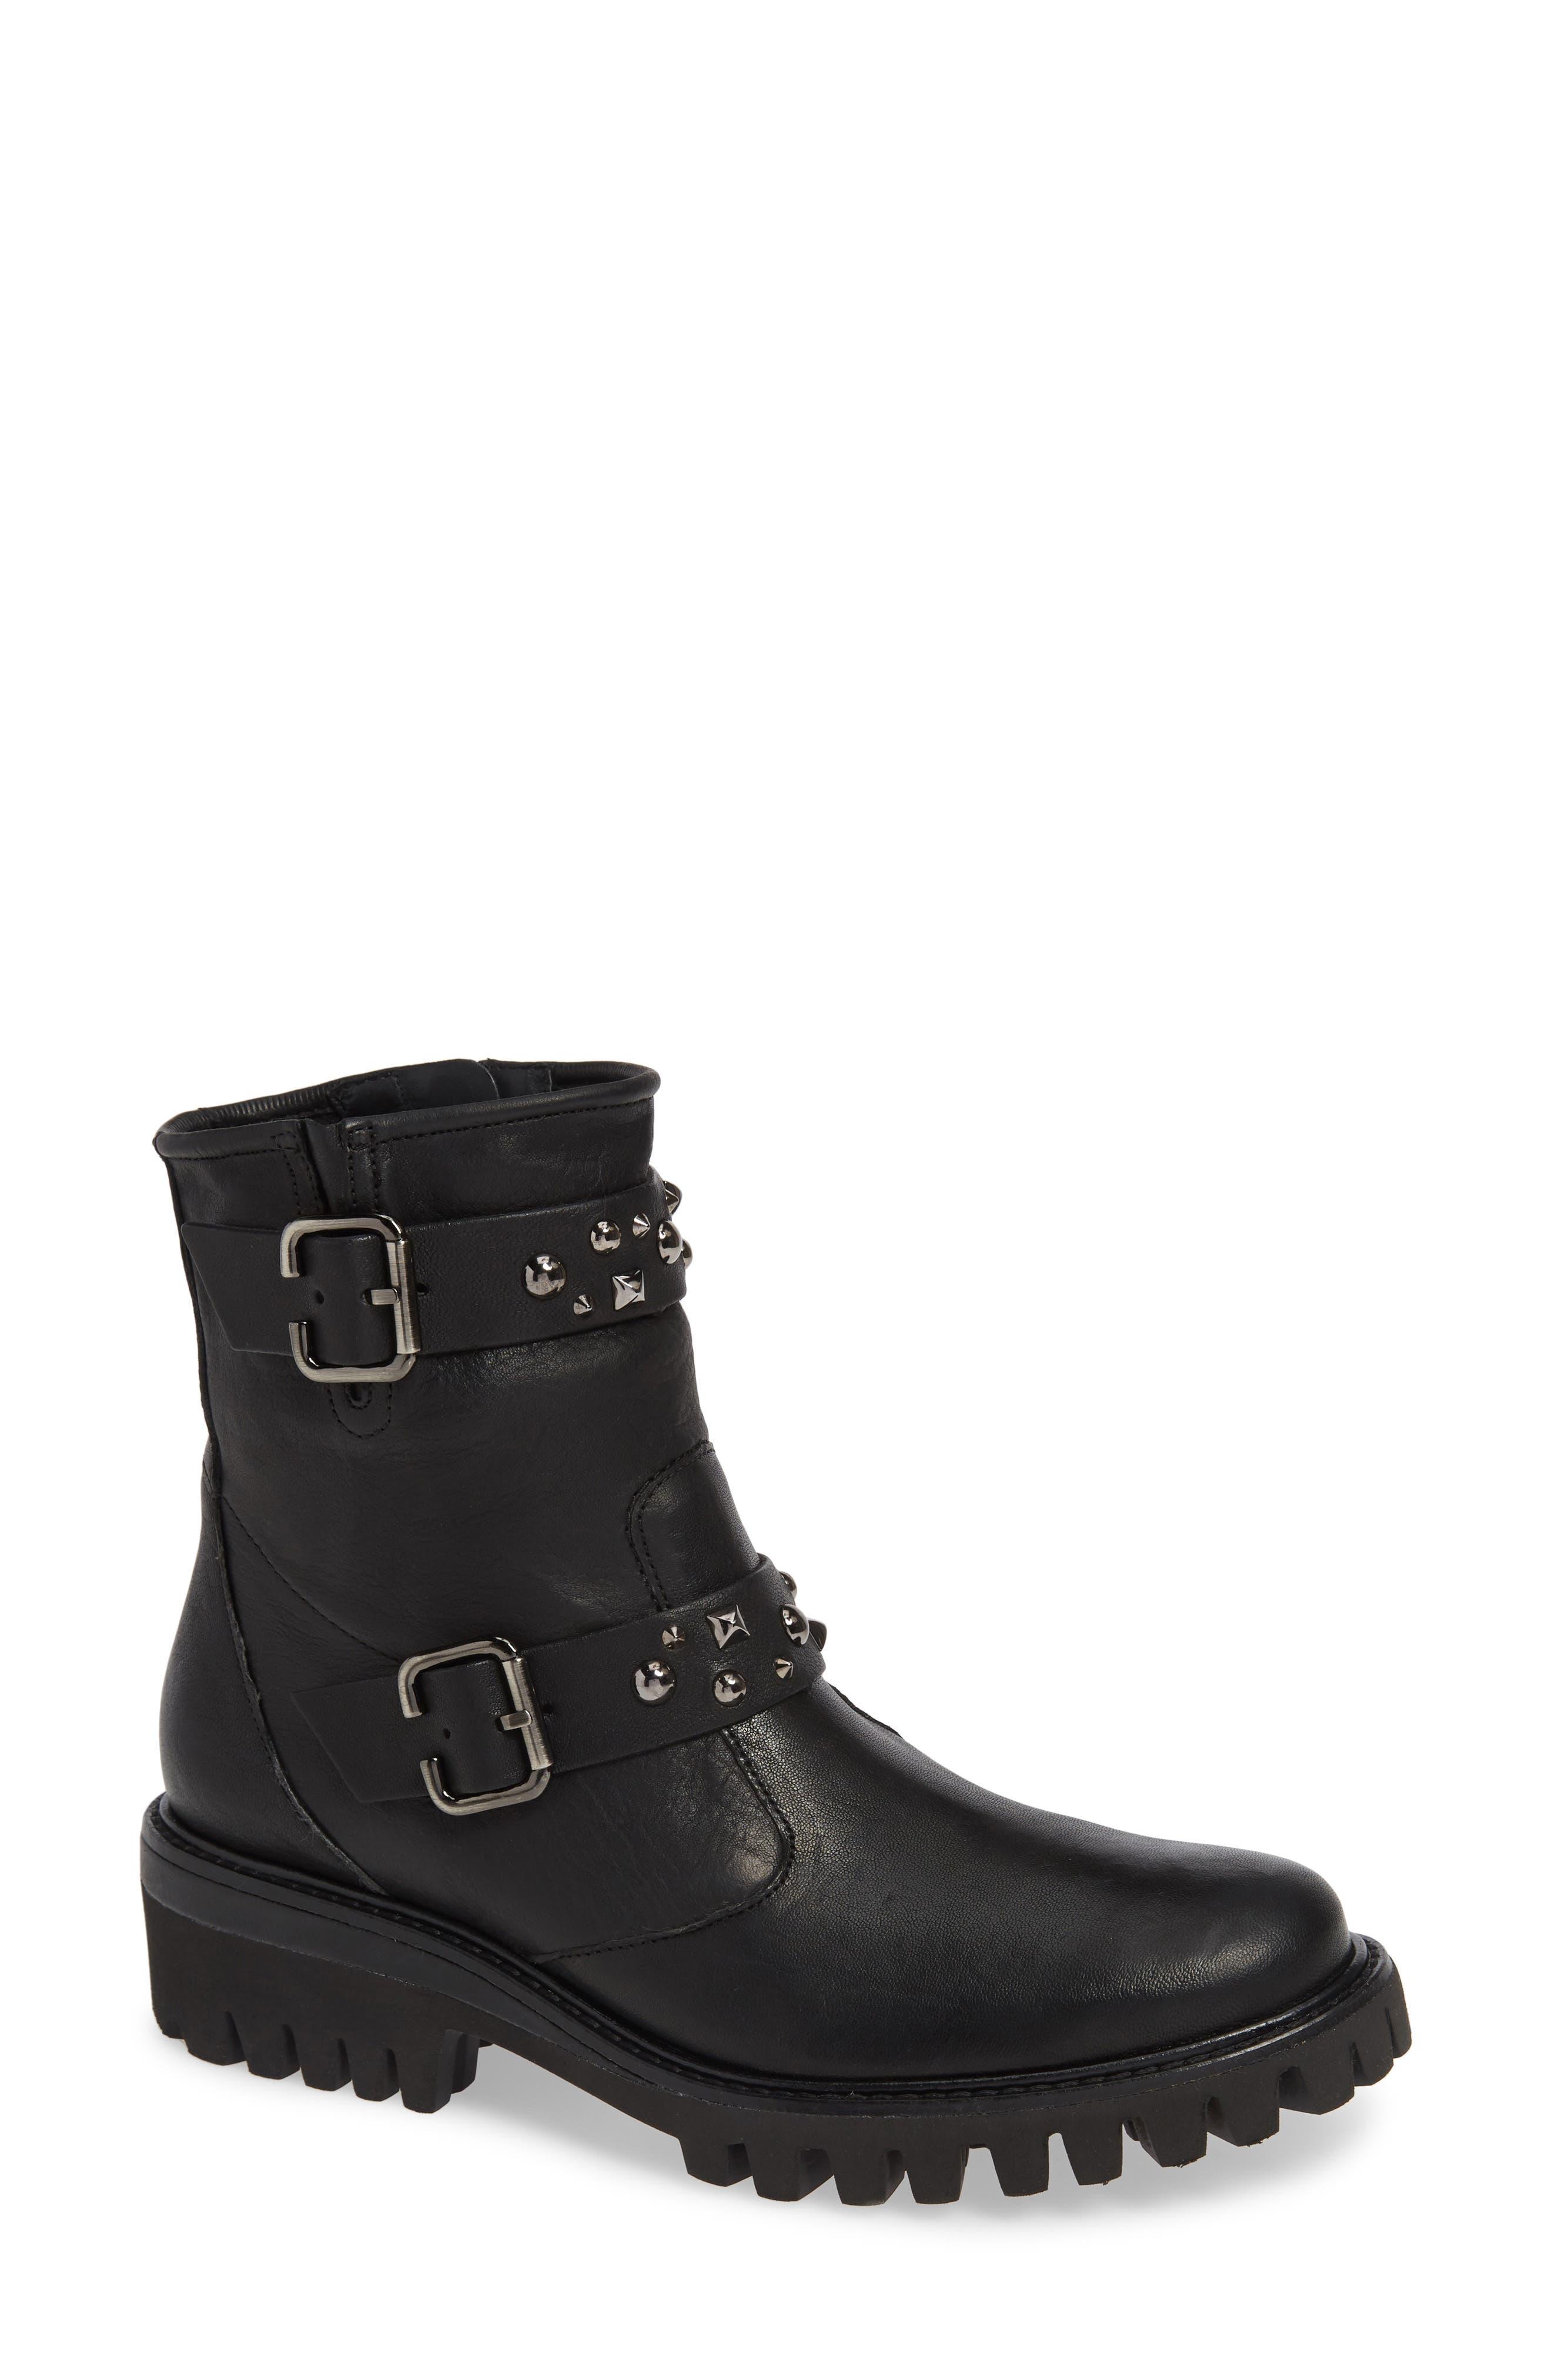 Paul Green Veronia Studded Buckle Boot, .5UK - Black